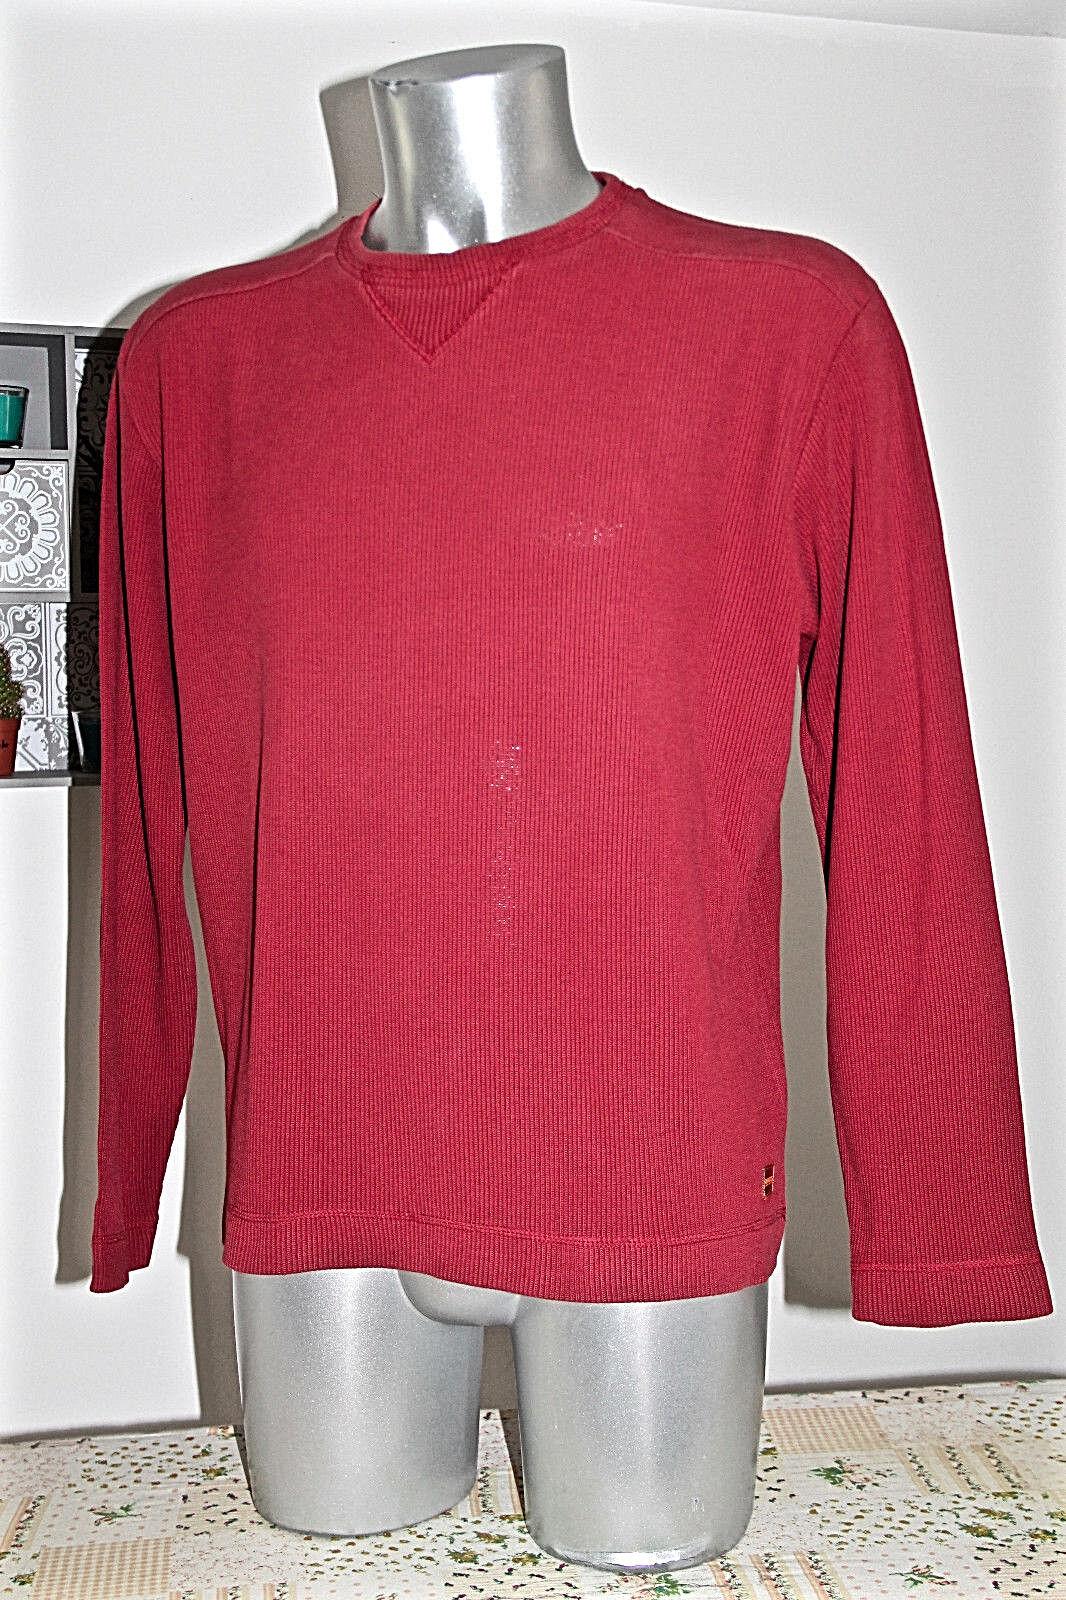 HUGO BOSS NARANJA muy bonito suéter rojo talla L de hombre EXCELENTE ESTADO